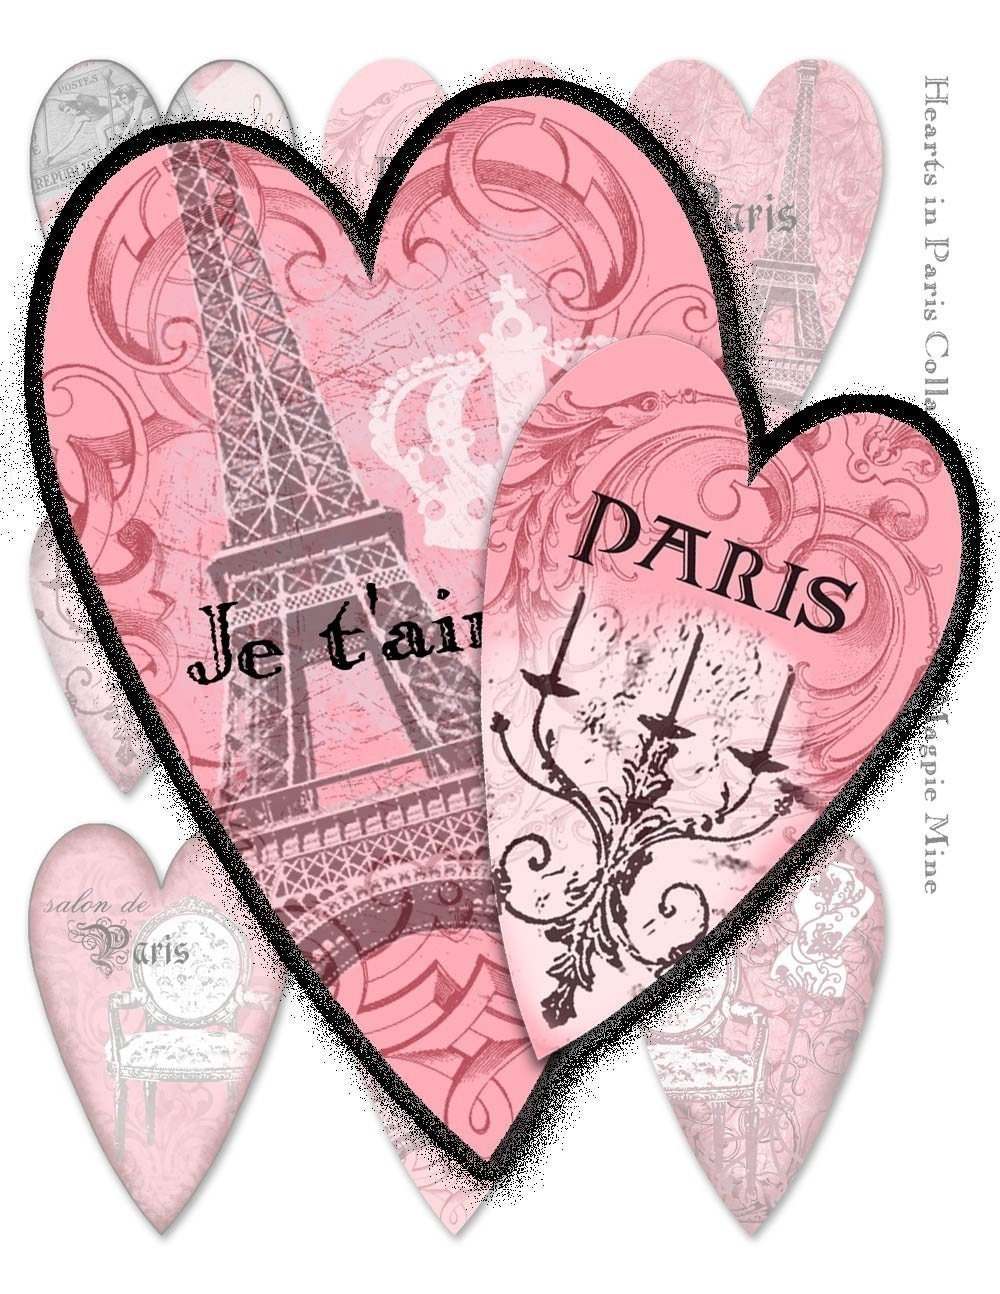 Paris hearts collage sheet perfect for valentines instant - Fotos decorativas ...